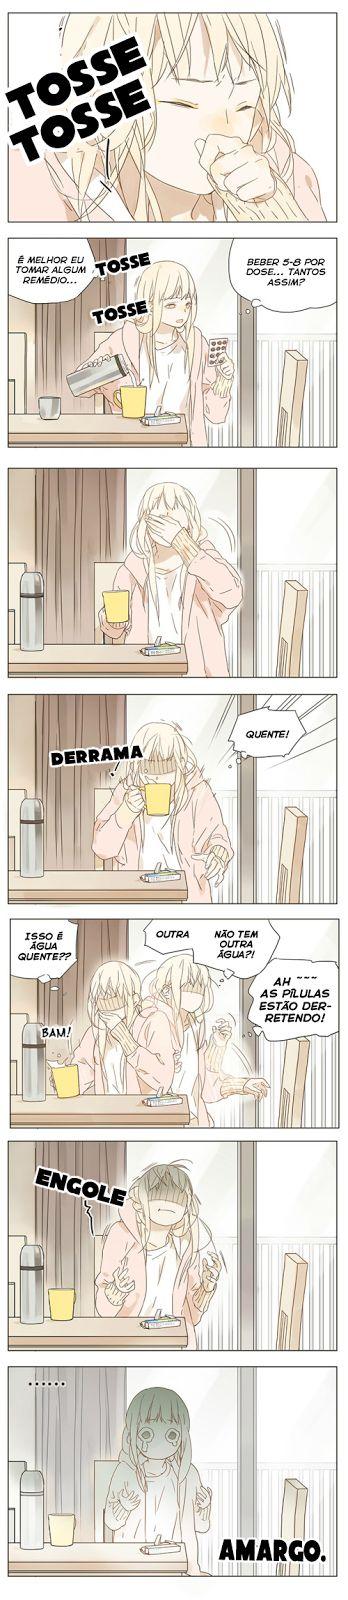 Armazém Yuri - Galeria de mangás: Tamen de Gushi - Capítulo 05